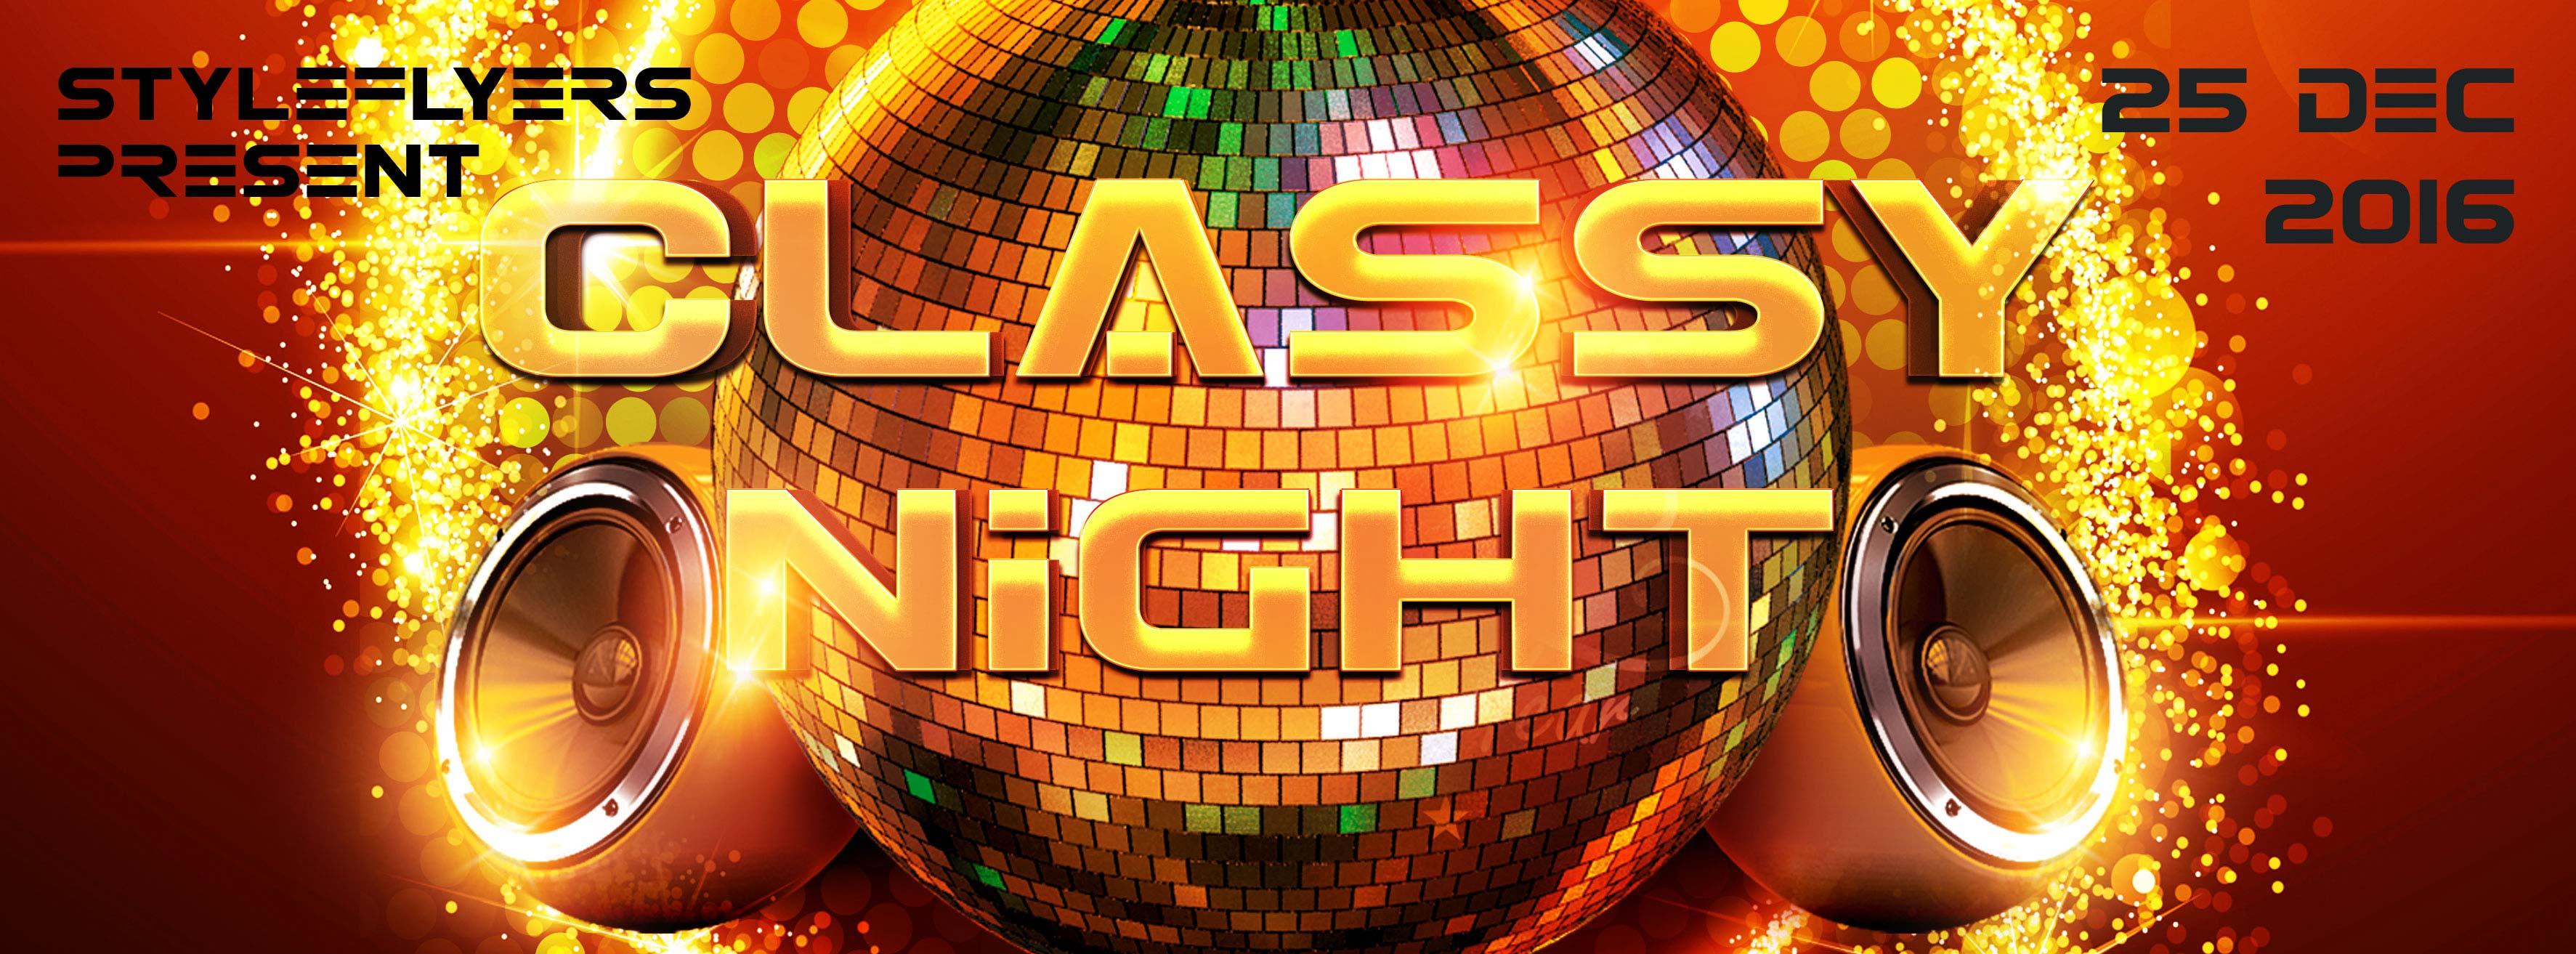 Classy Night  PSD Flyer Template